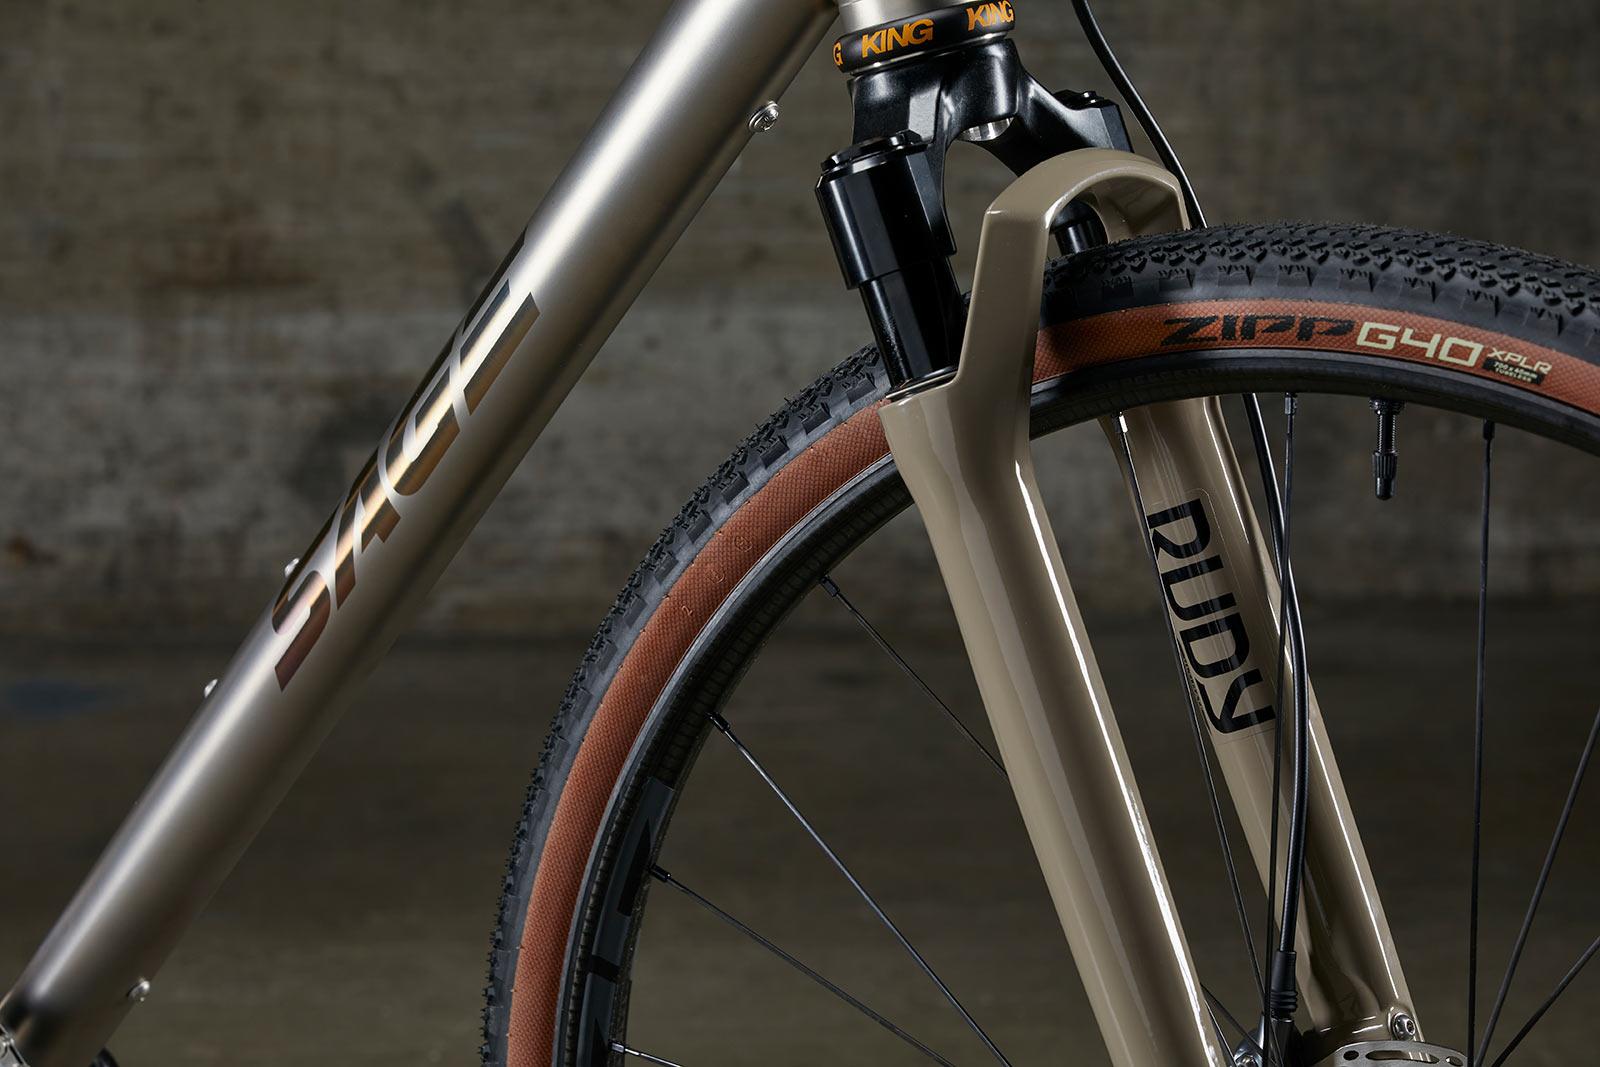 rockshox rudy gravel suspension fork on new sage storm king ti bike